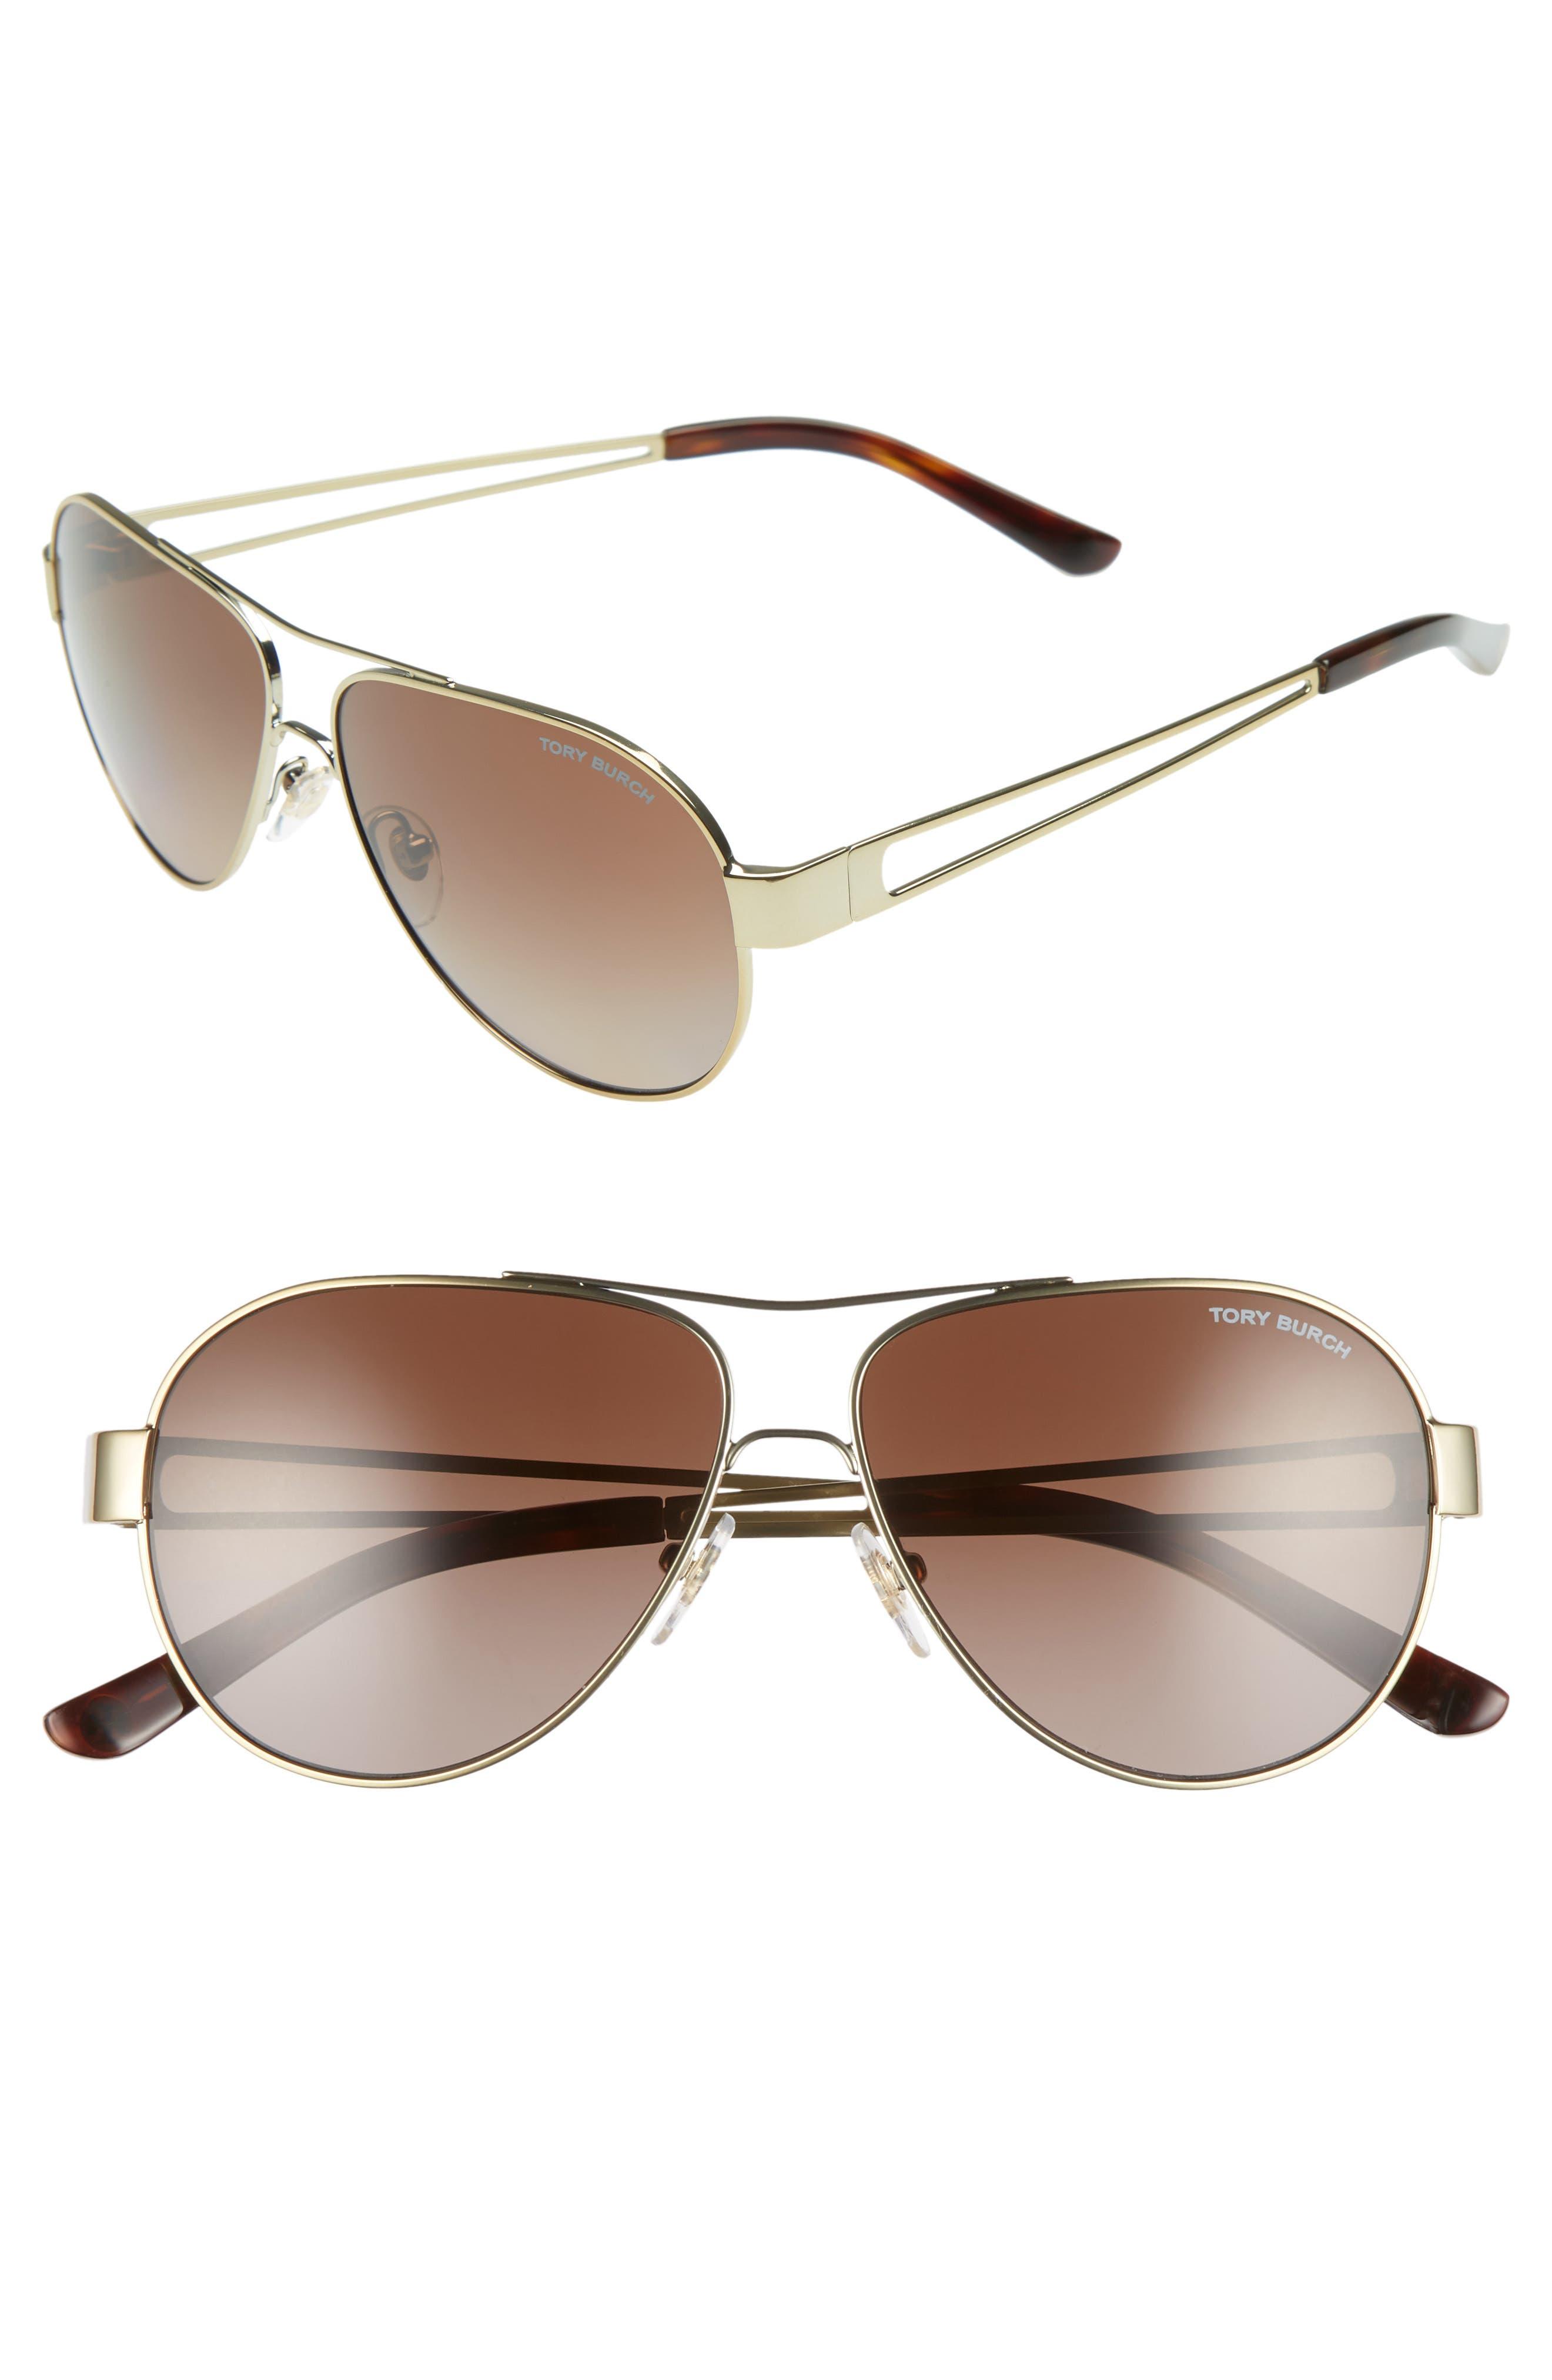 55mm Polarized Aviator Sunglasses,                         Main,                         color, Gold/ Dark Tortoise Gradient